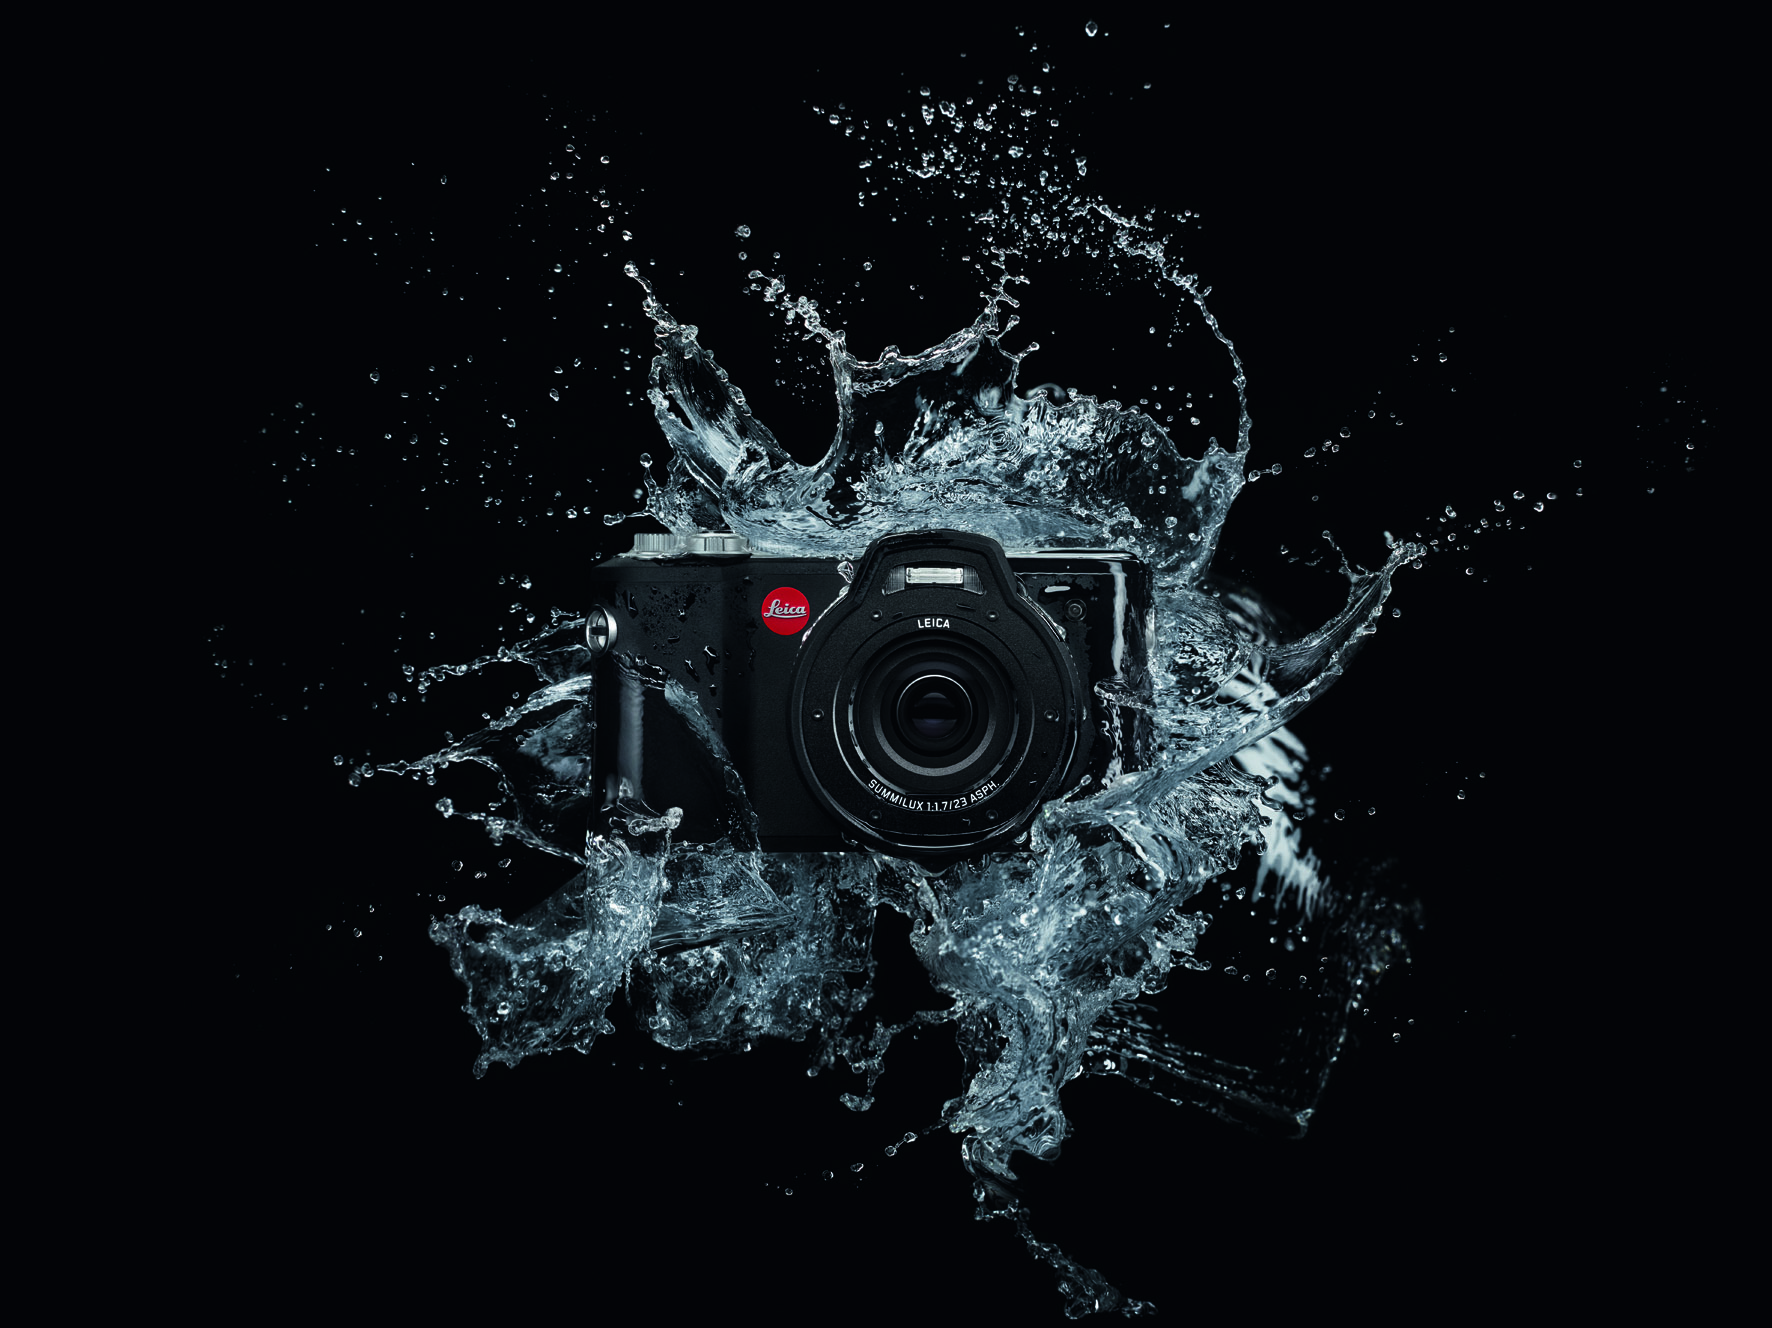 Leica X-U_action_water splash